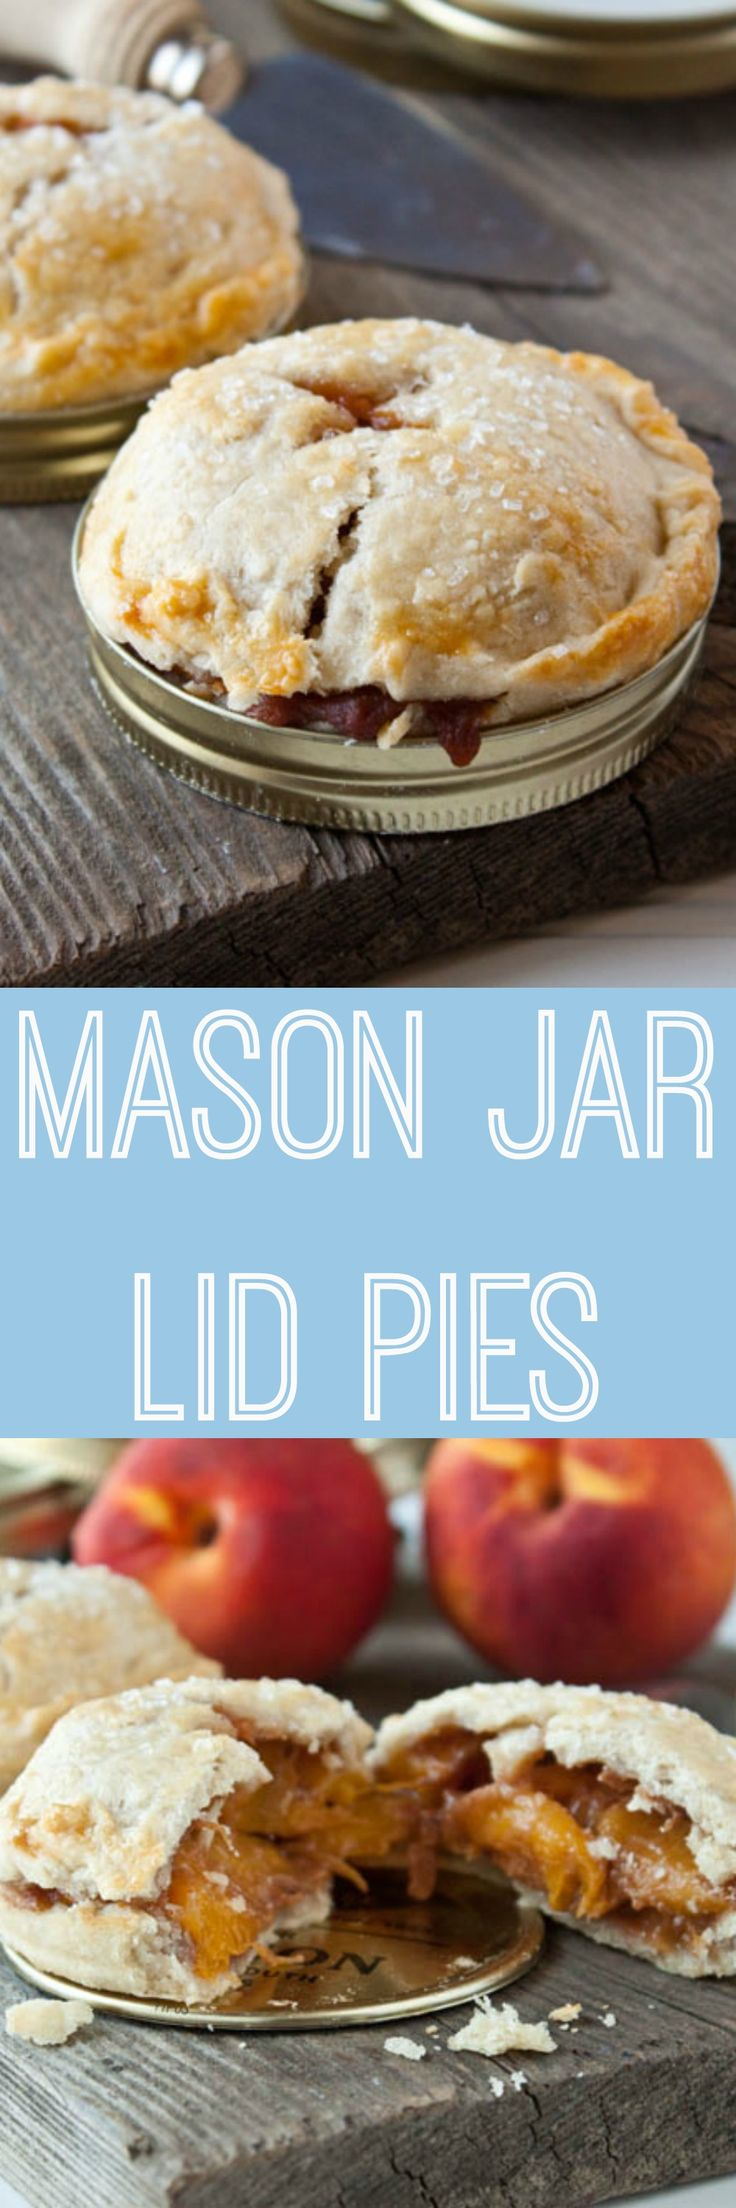 Make mini pies in mason jar lid rings! So cute!